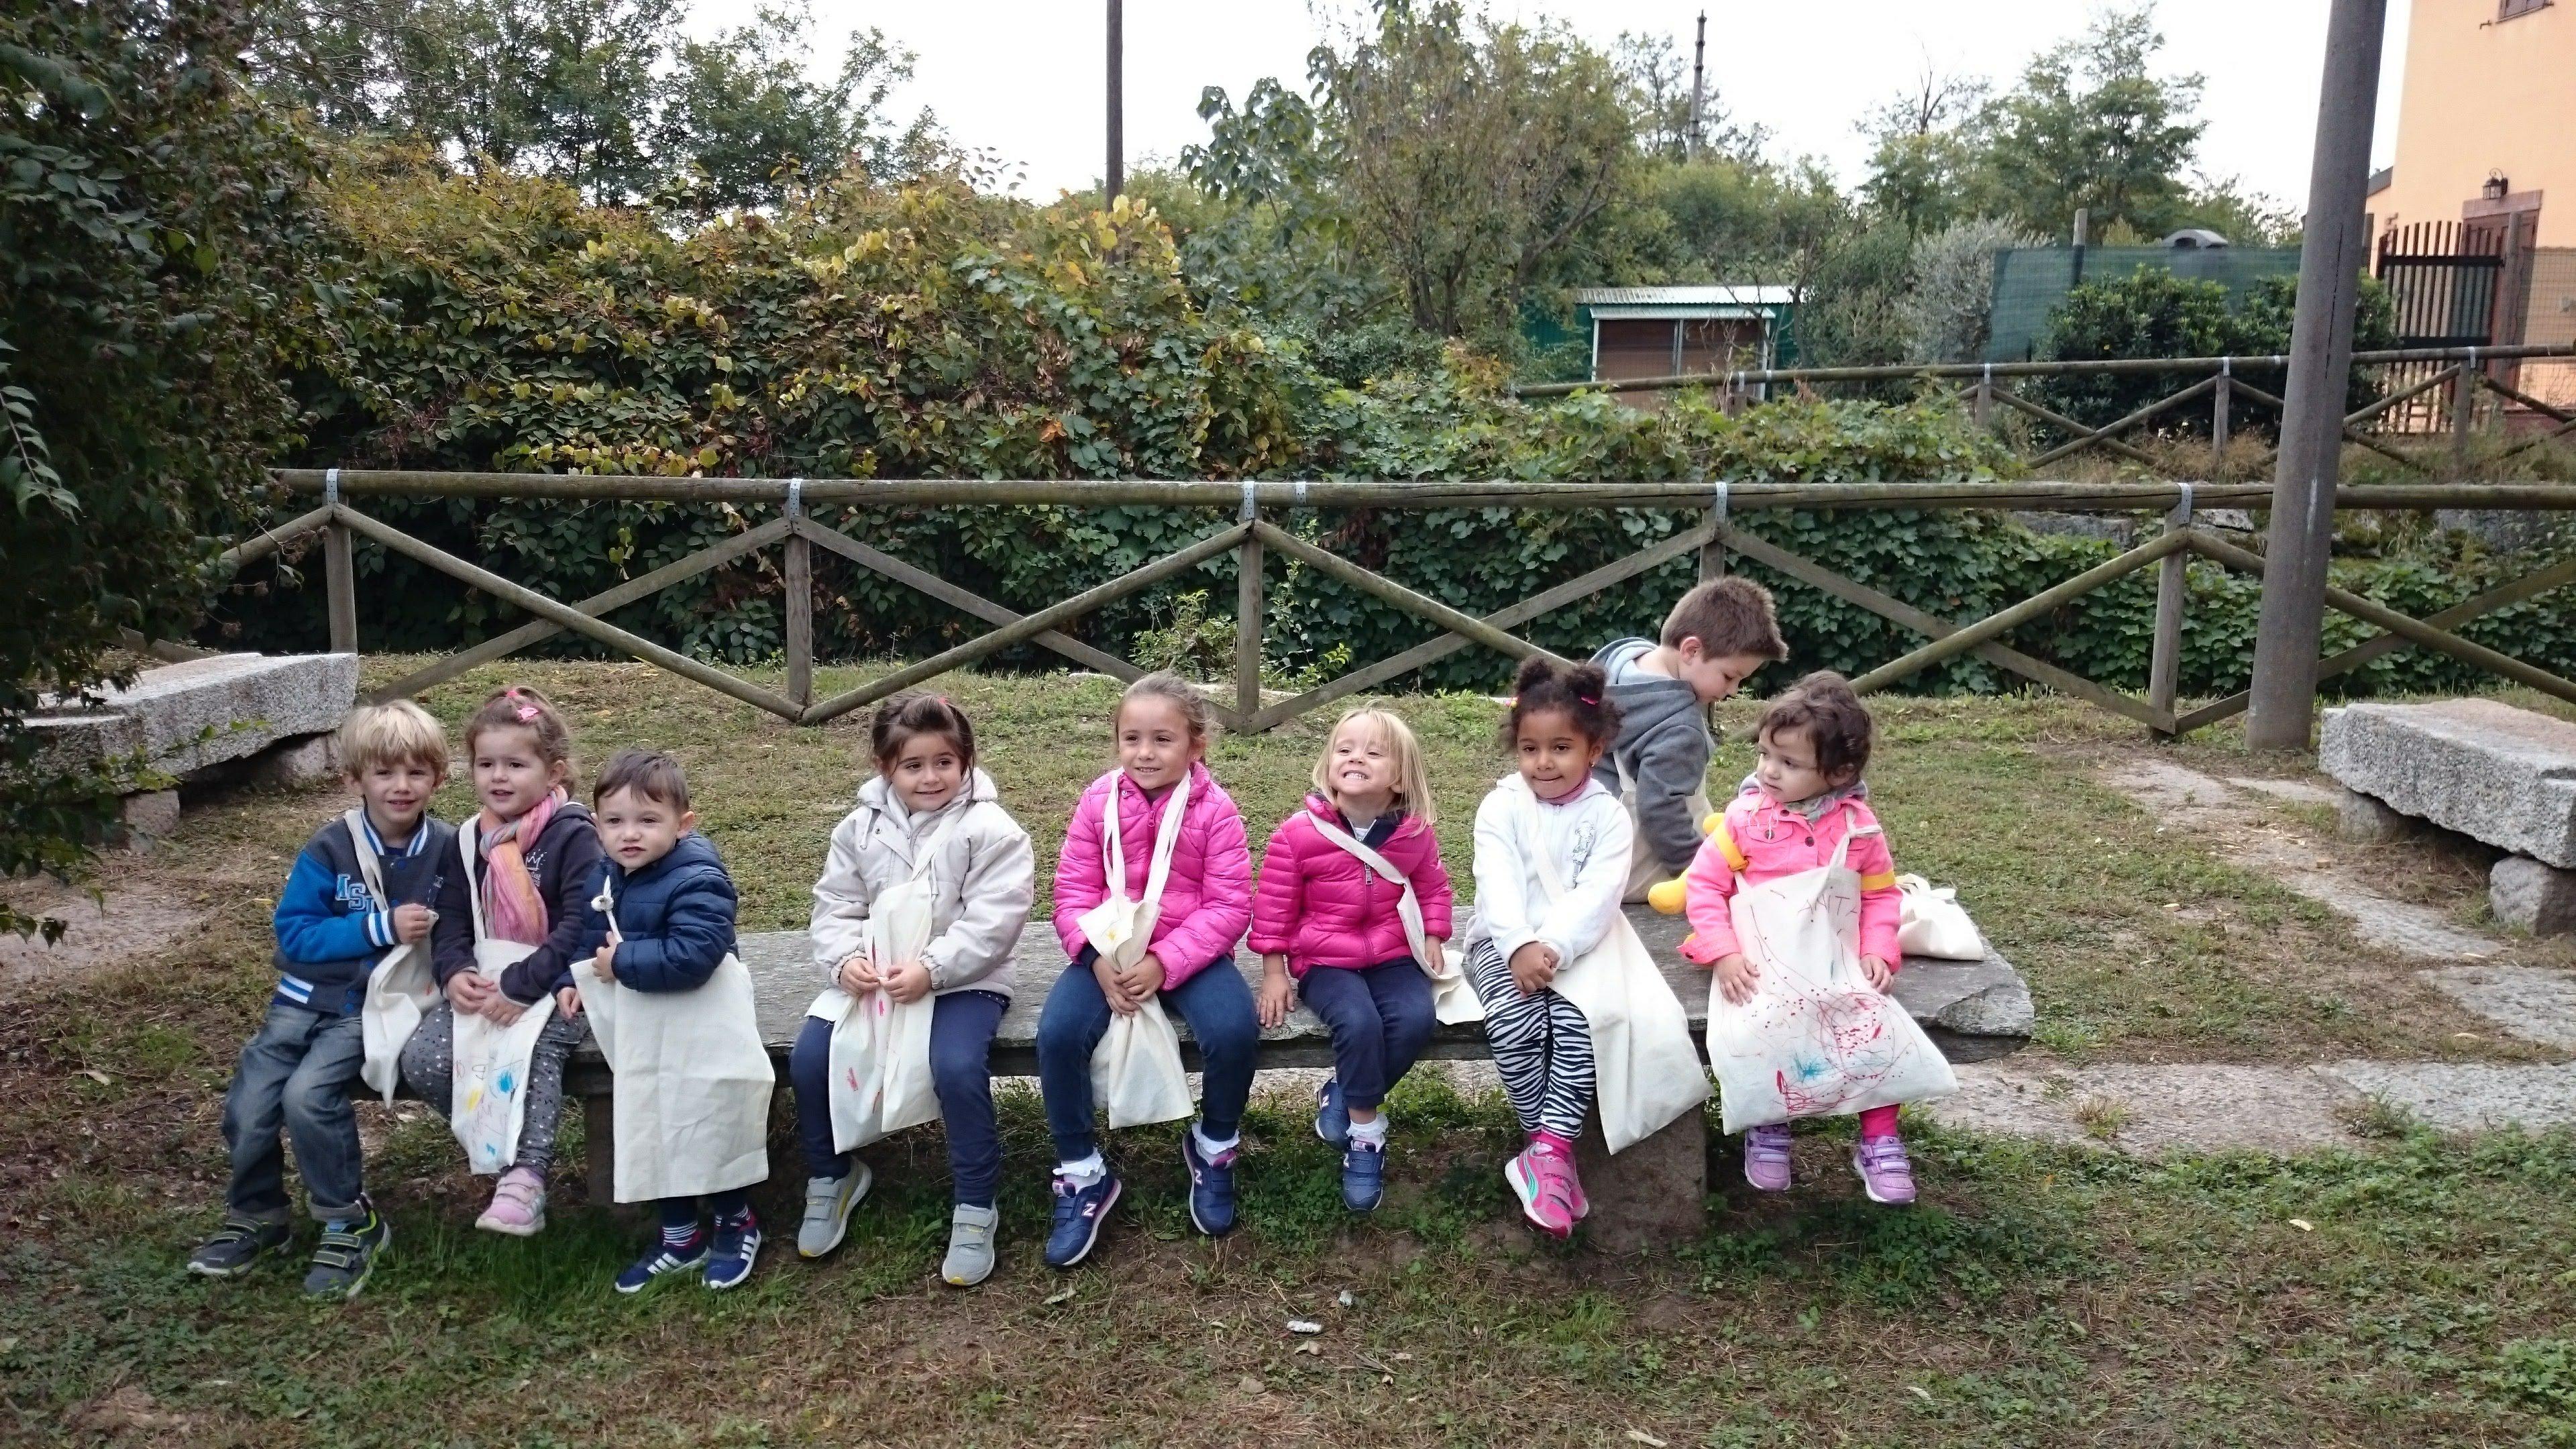 Gruppo di bambini che sorridono